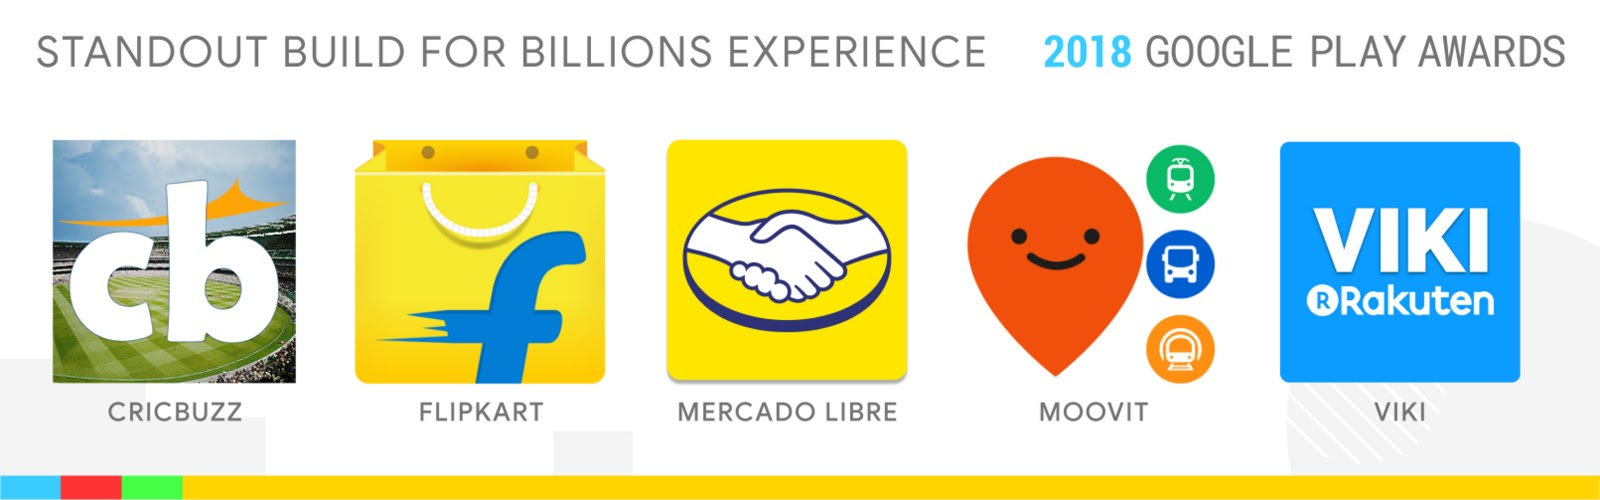 Standout Build for Billions Experience: Cricbuzz, Flipkart, Mercado Libre, Moovit, Viki